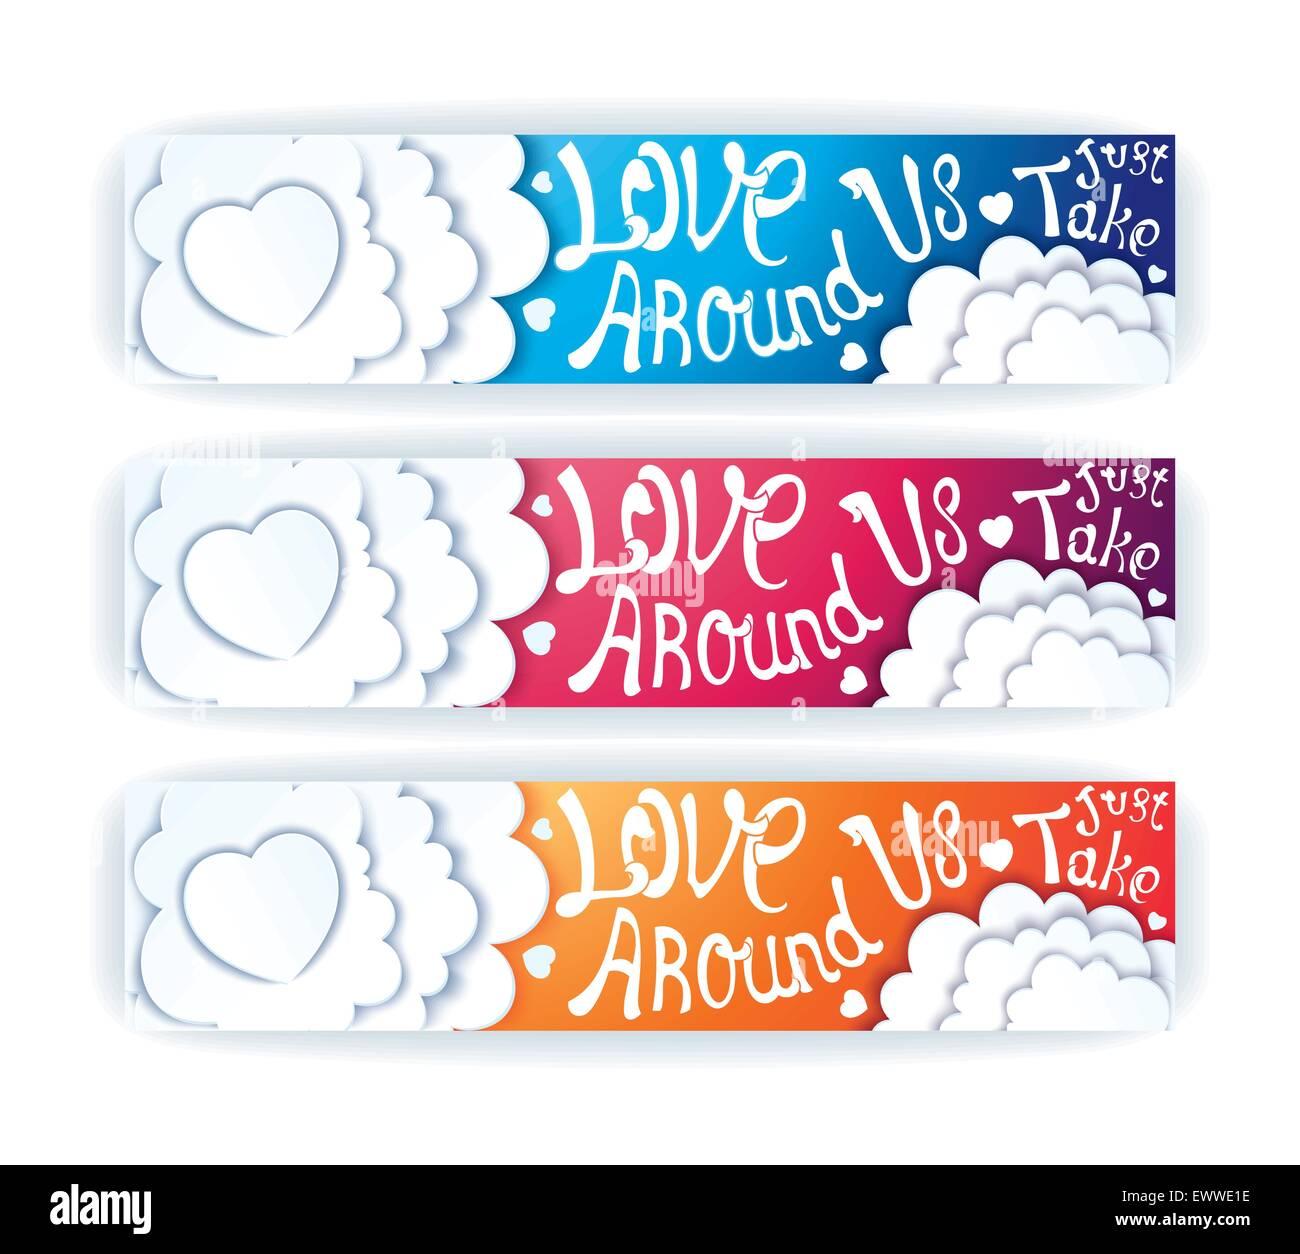 Love Artwork Stock Photos & Love Artwork Stock Images - Alamy